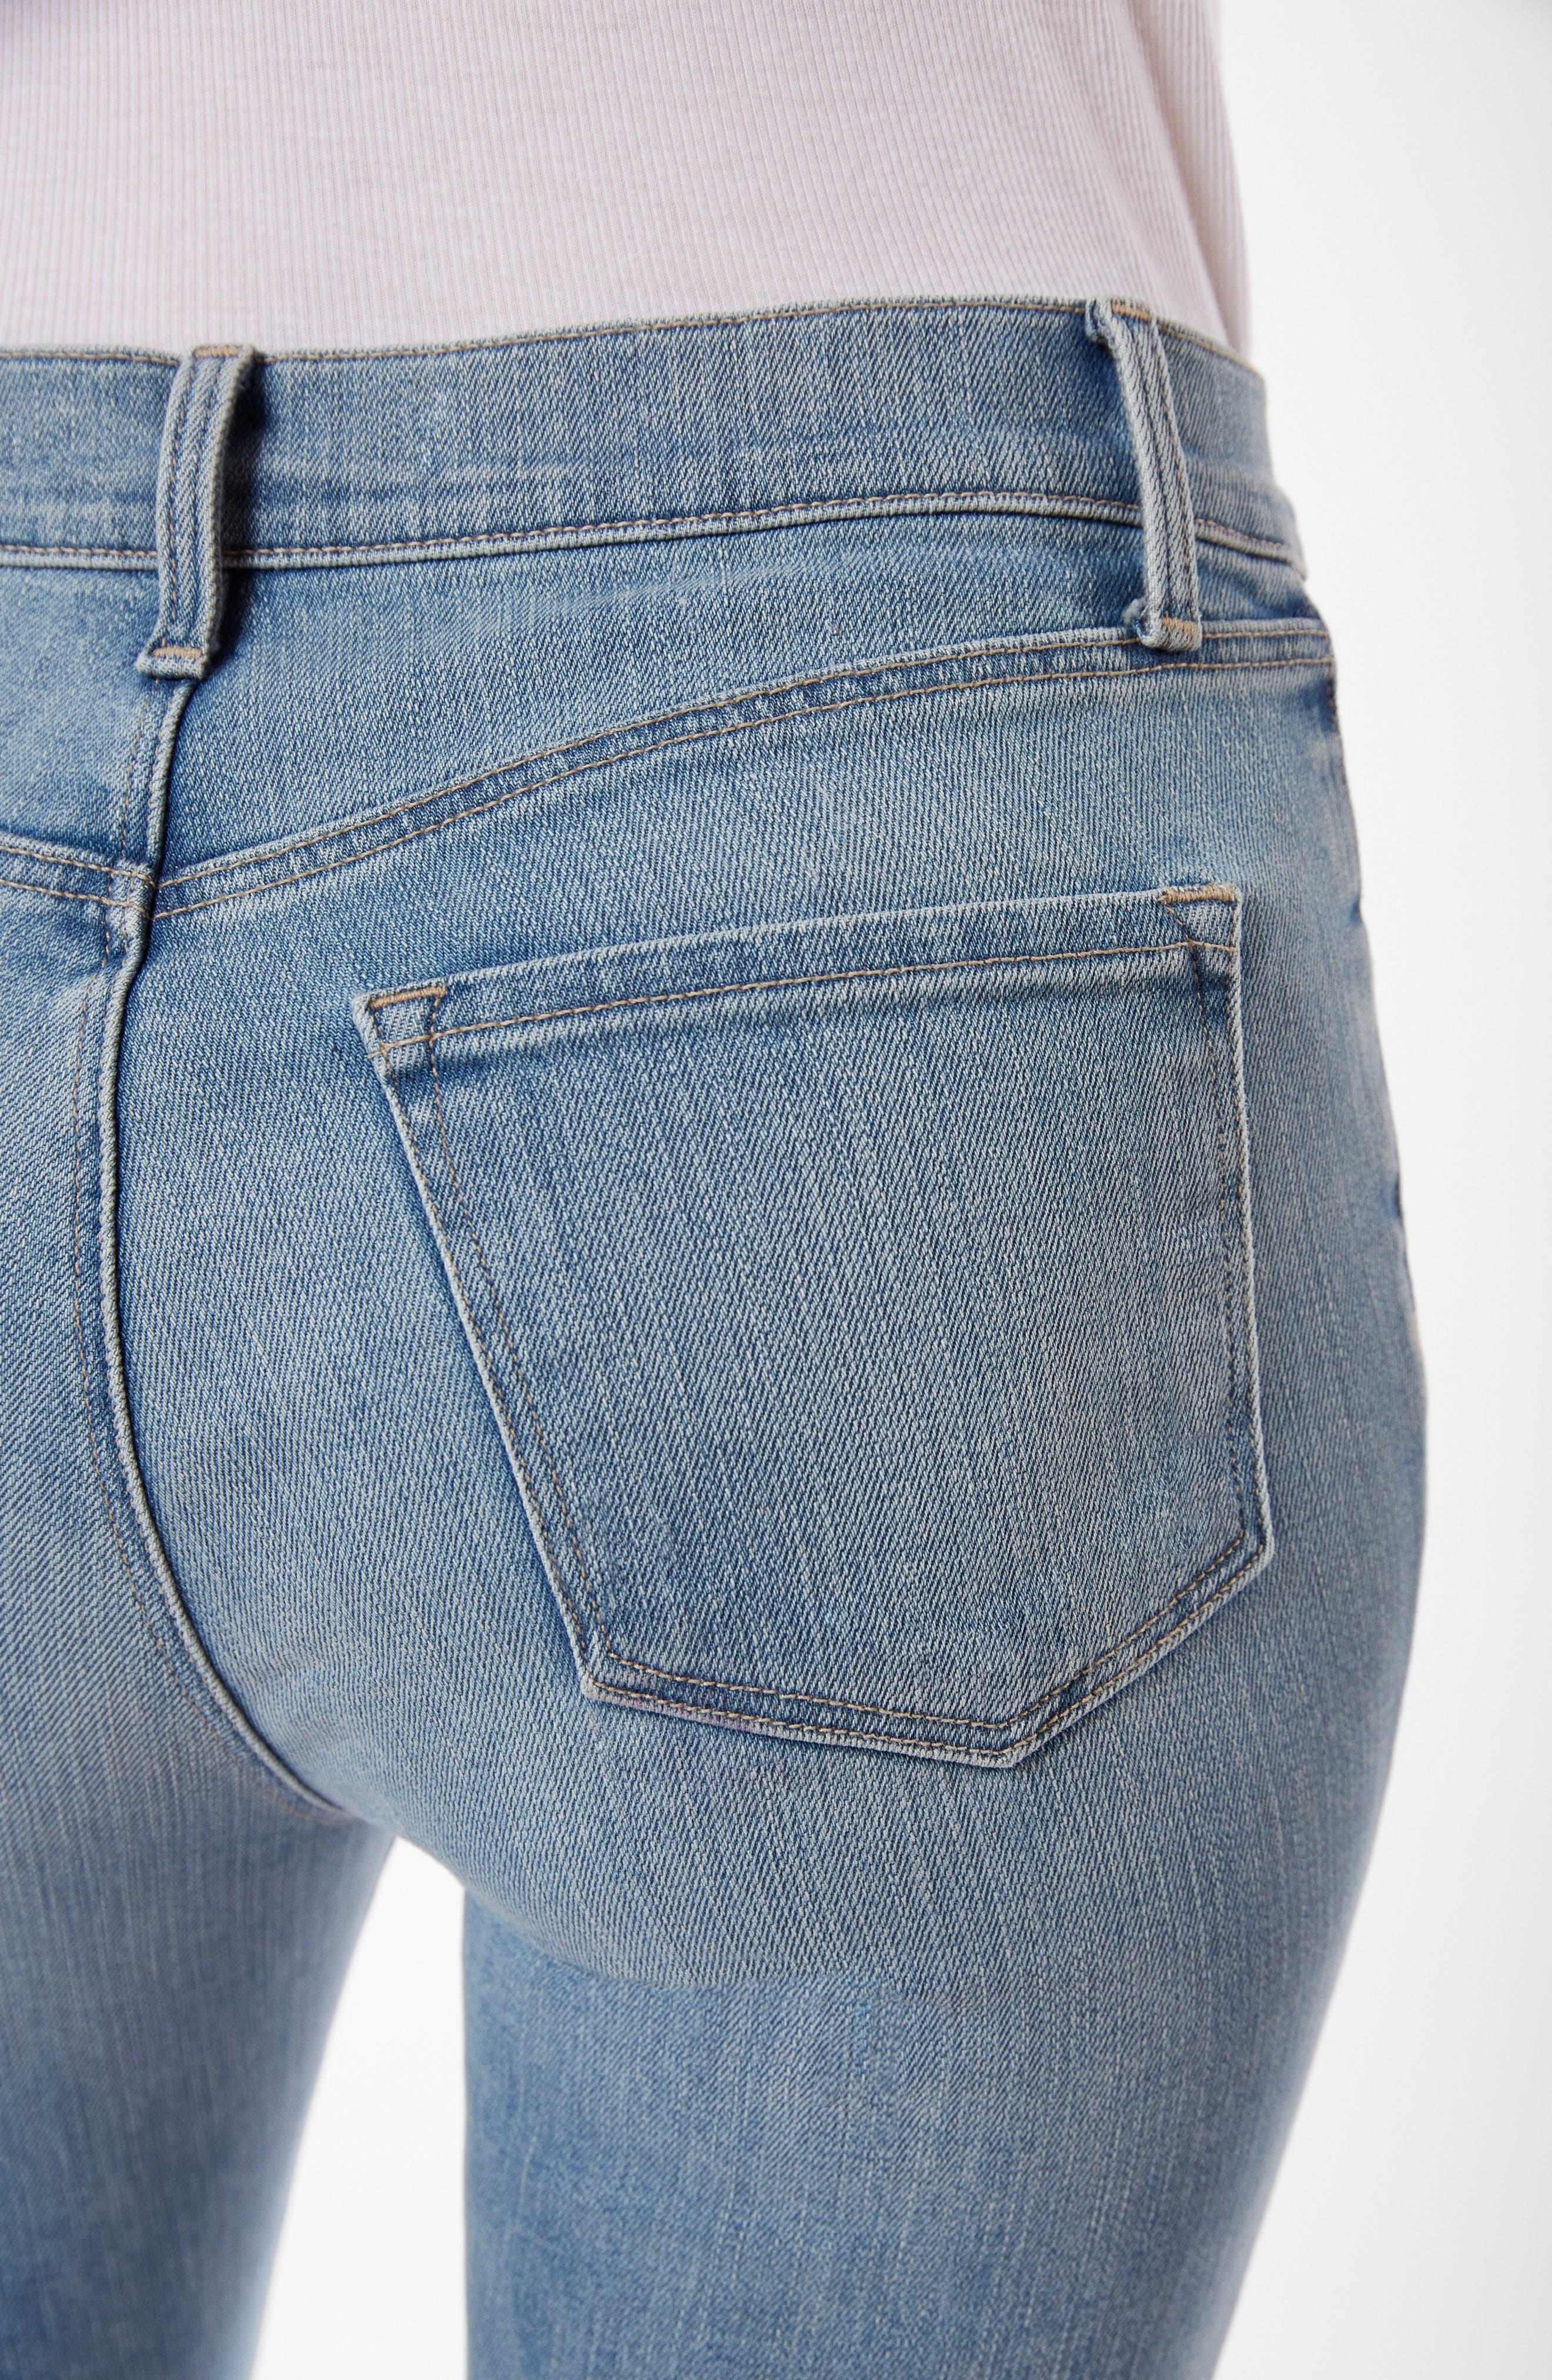 Alana Crop Skinny Jeans,                             Alternate thumbnail 4, color,                             Surge